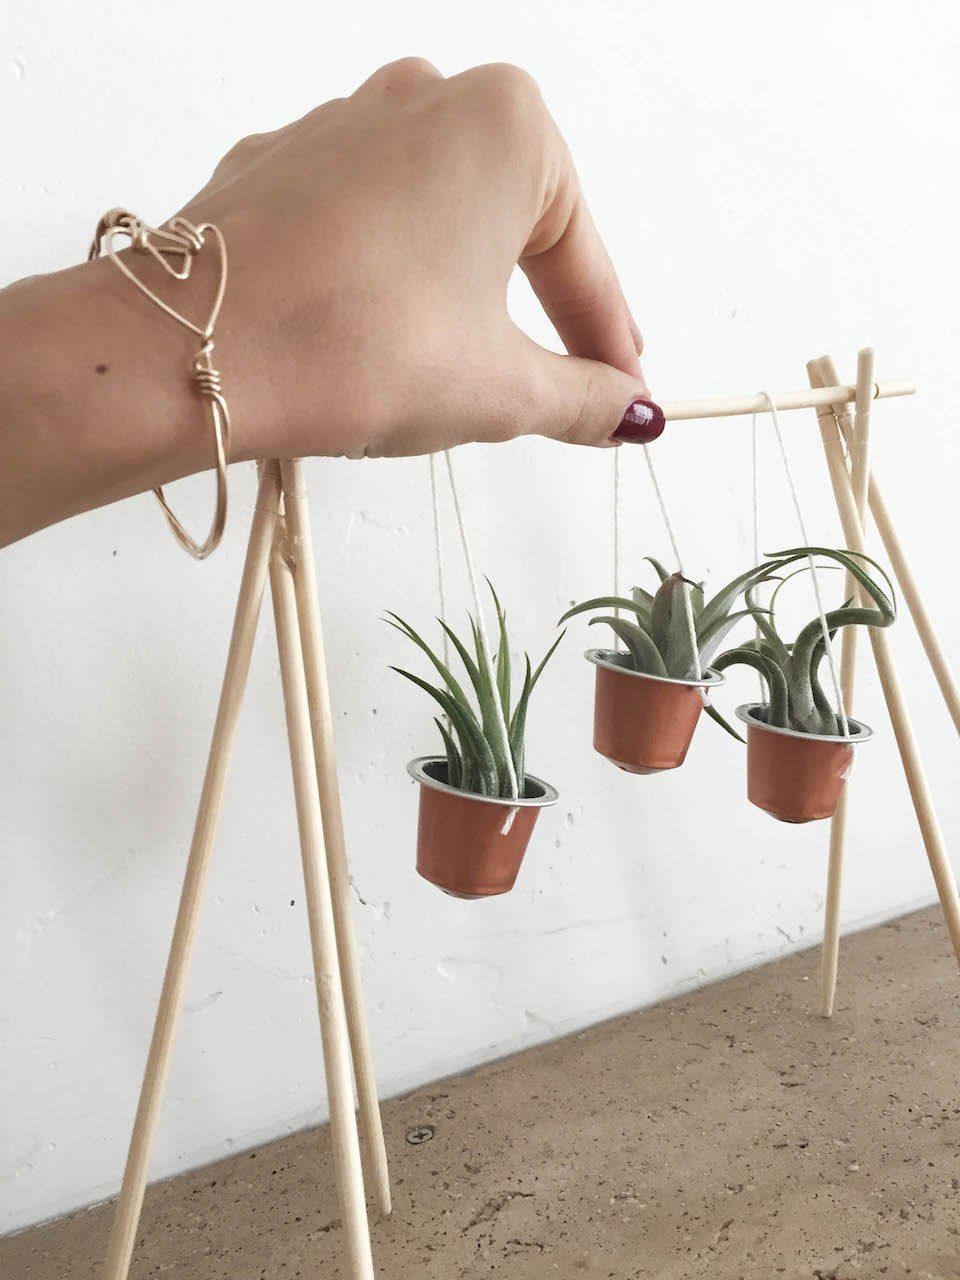 diy capsules nespresso en mini pots de fleurs nespresso nespresso kapseln und pflanzen. Black Bedroom Furniture Sets. Home Design Ideas